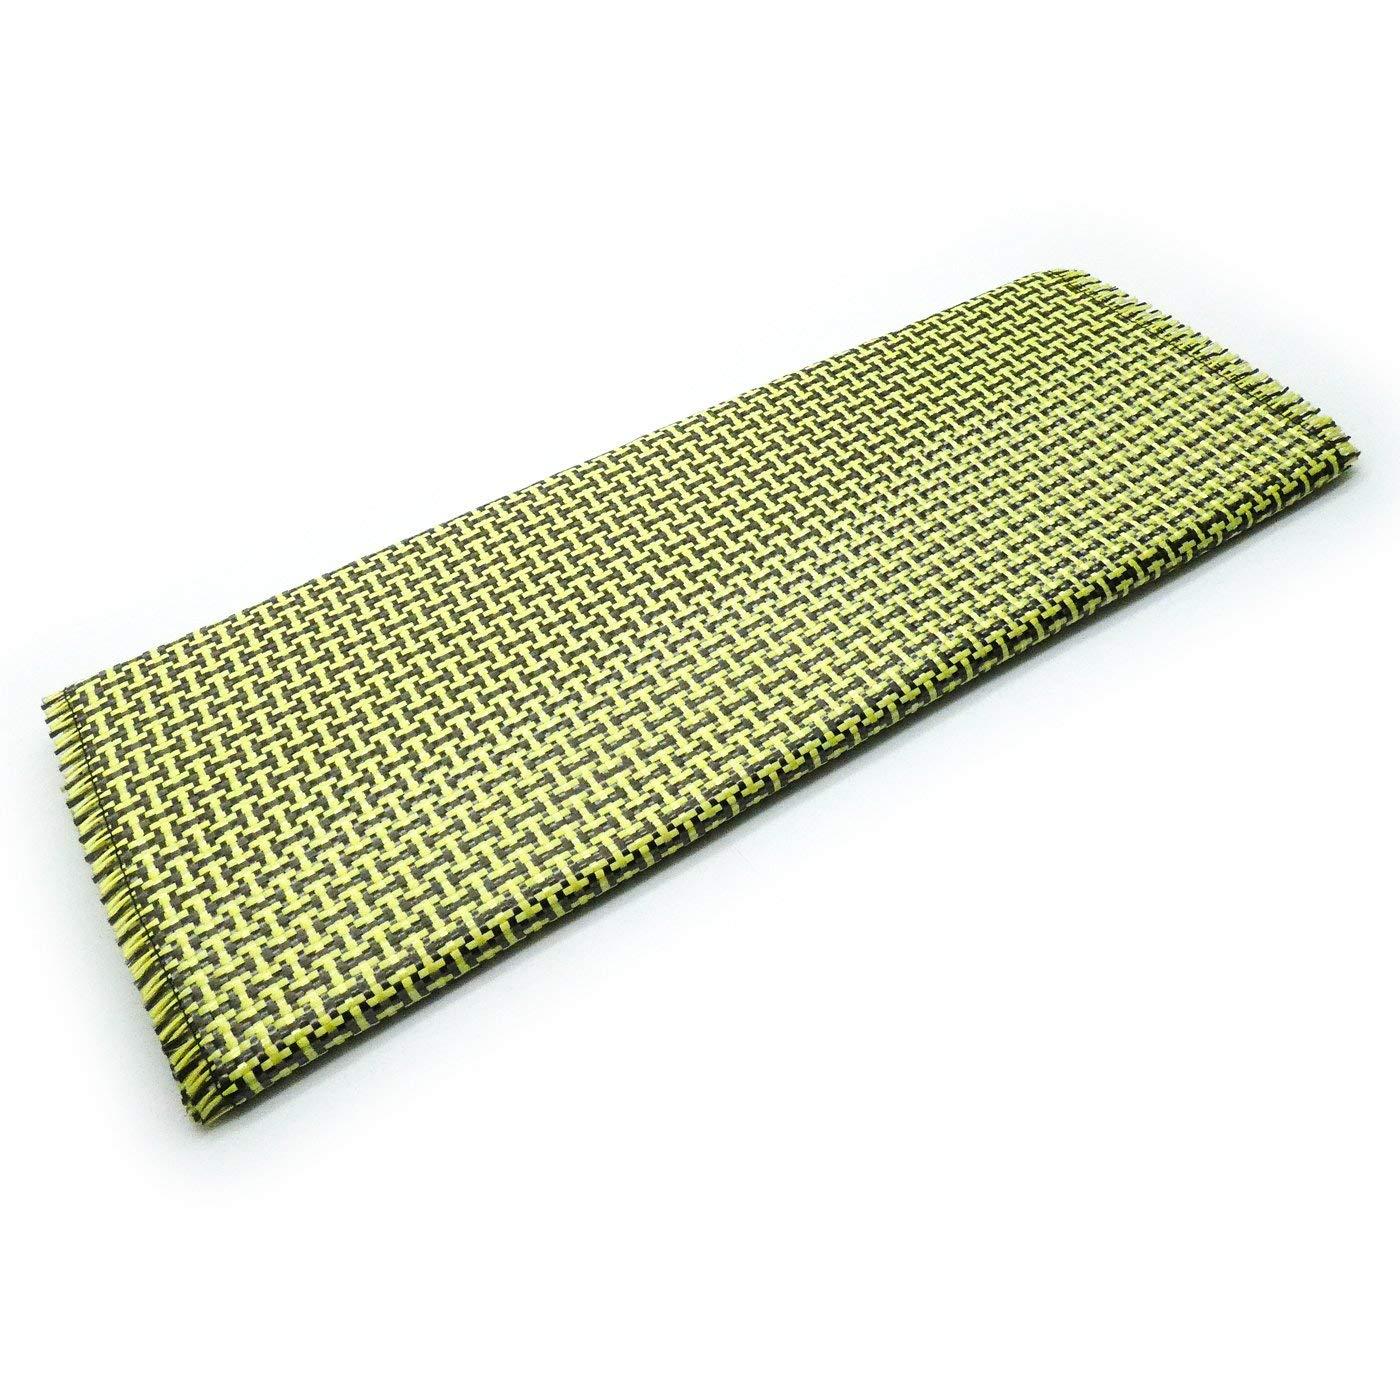 3K Carbon Fiber Free shipping on posting reviews Aramid Fabric Cloth 1000x350 m2 180g Woven Sheet Long Beach Mall